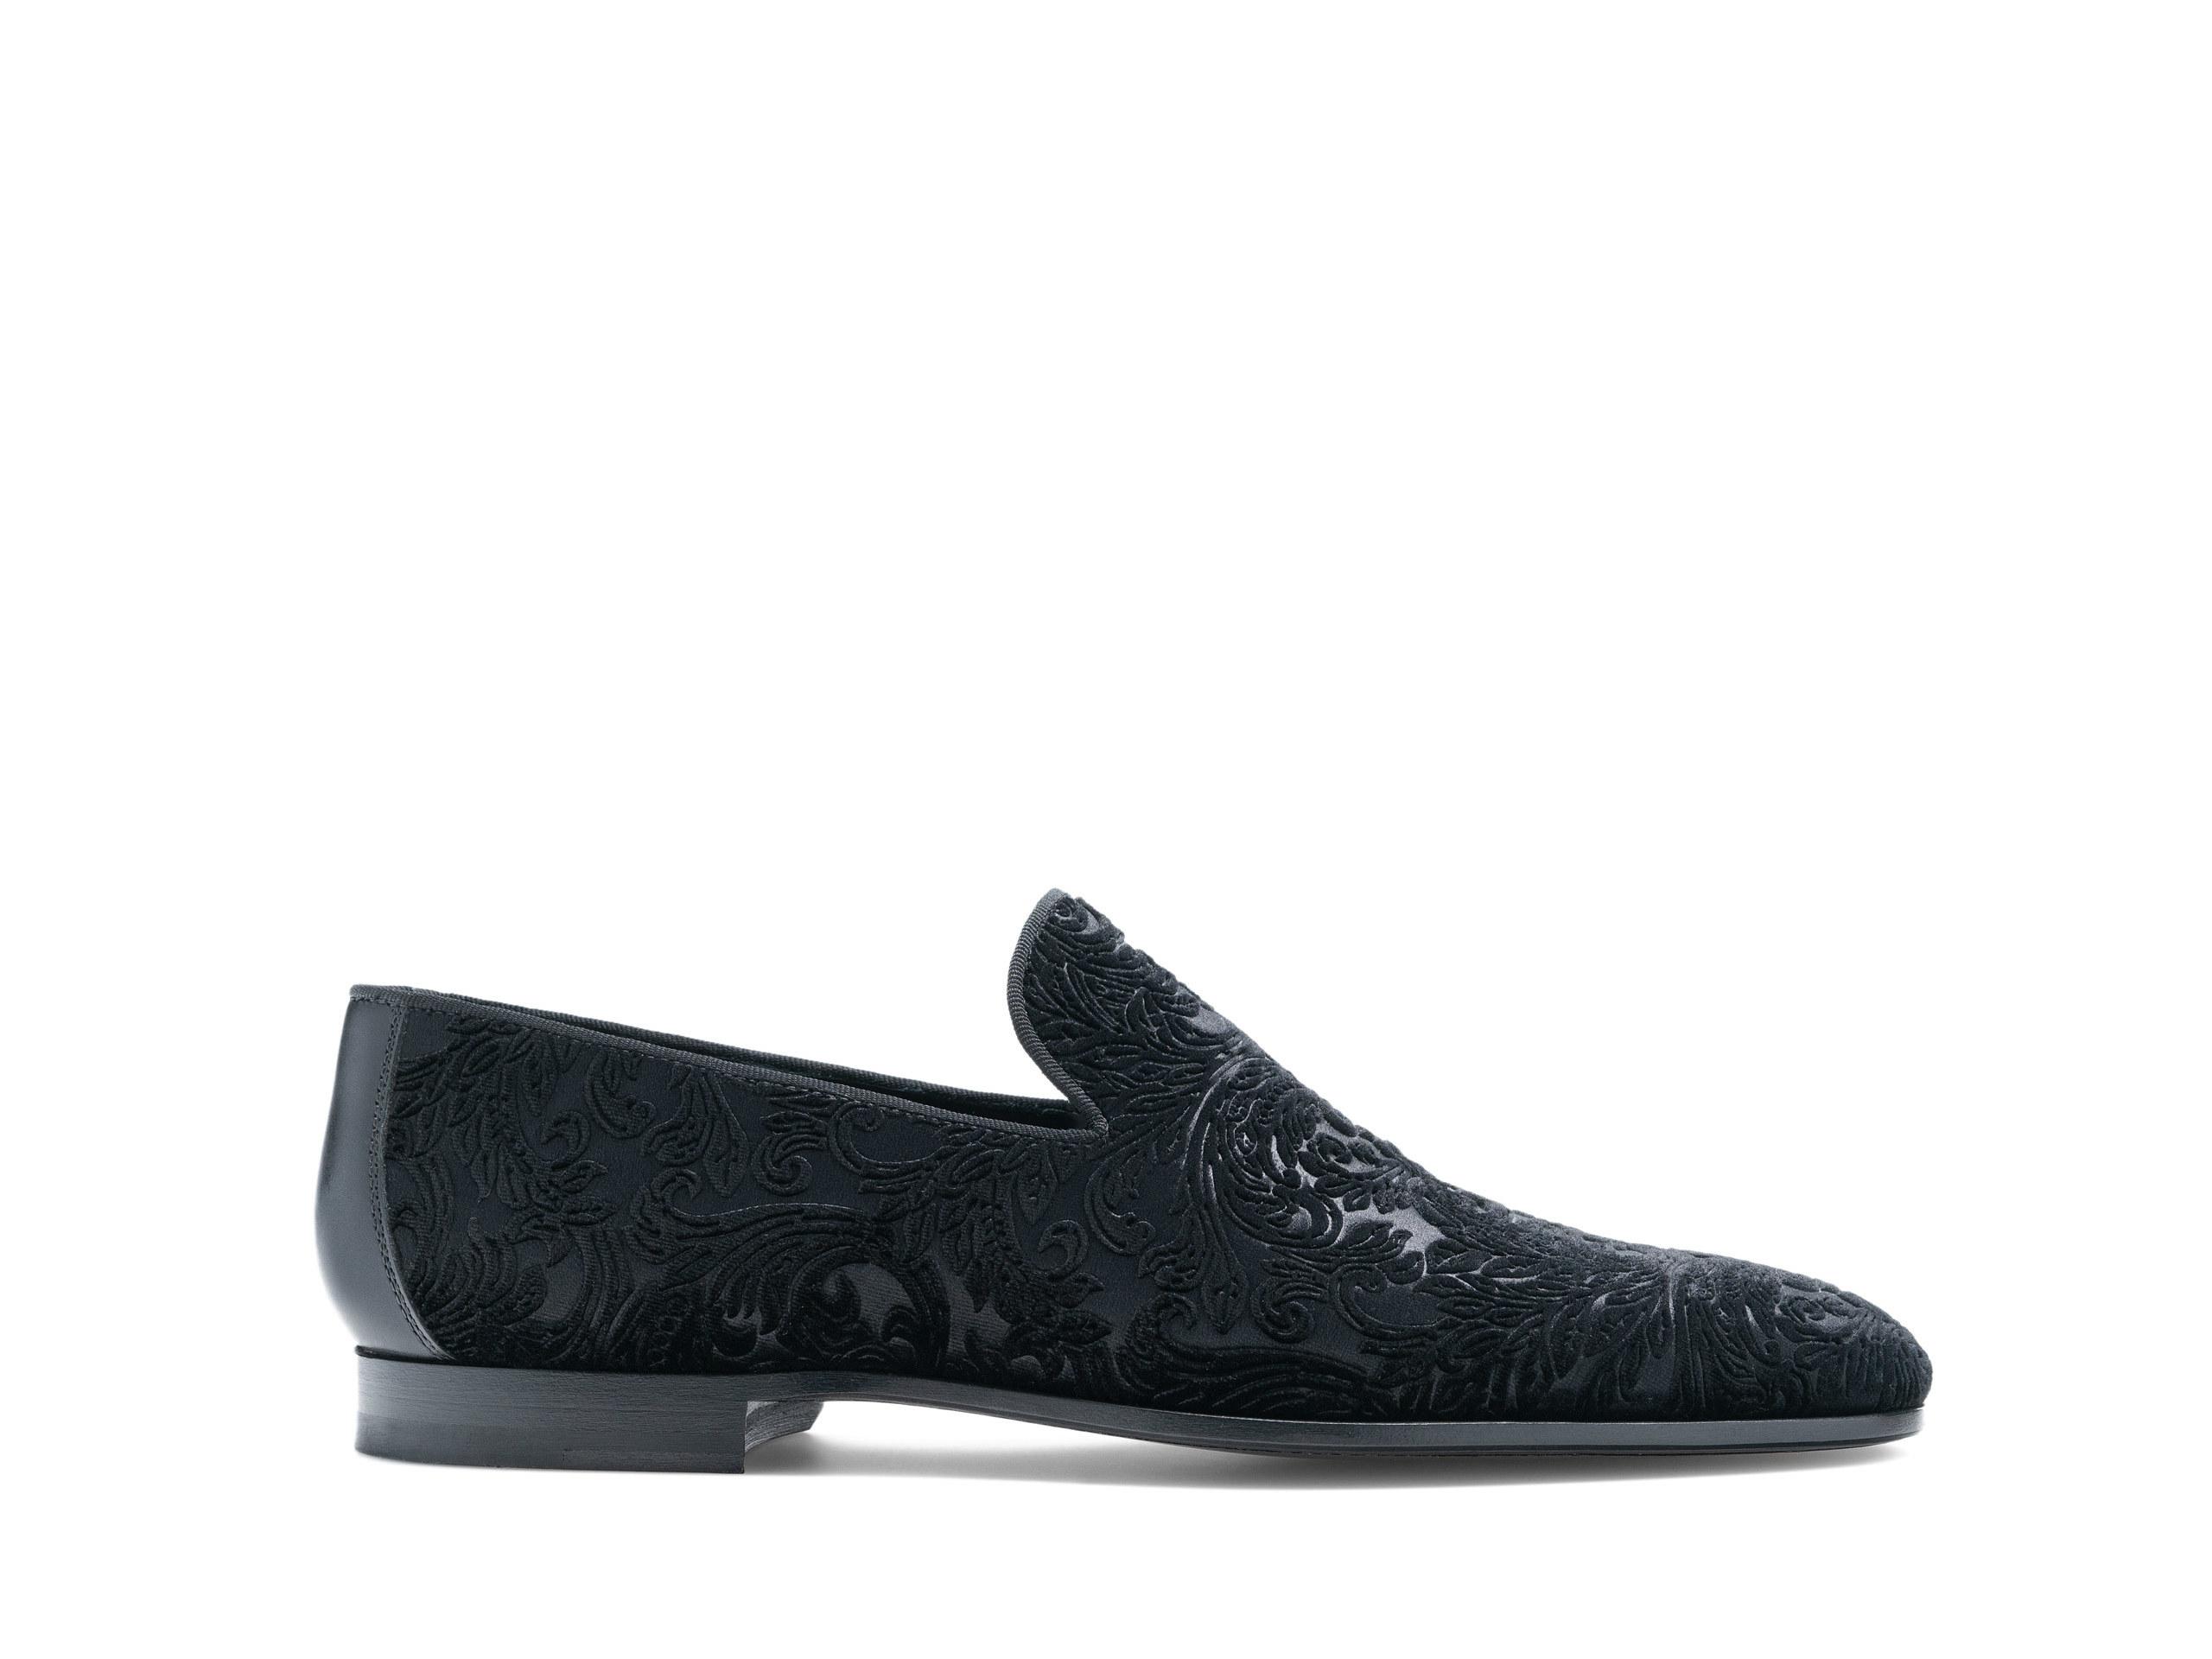 Side Profile of Vino Black Dress Loafers